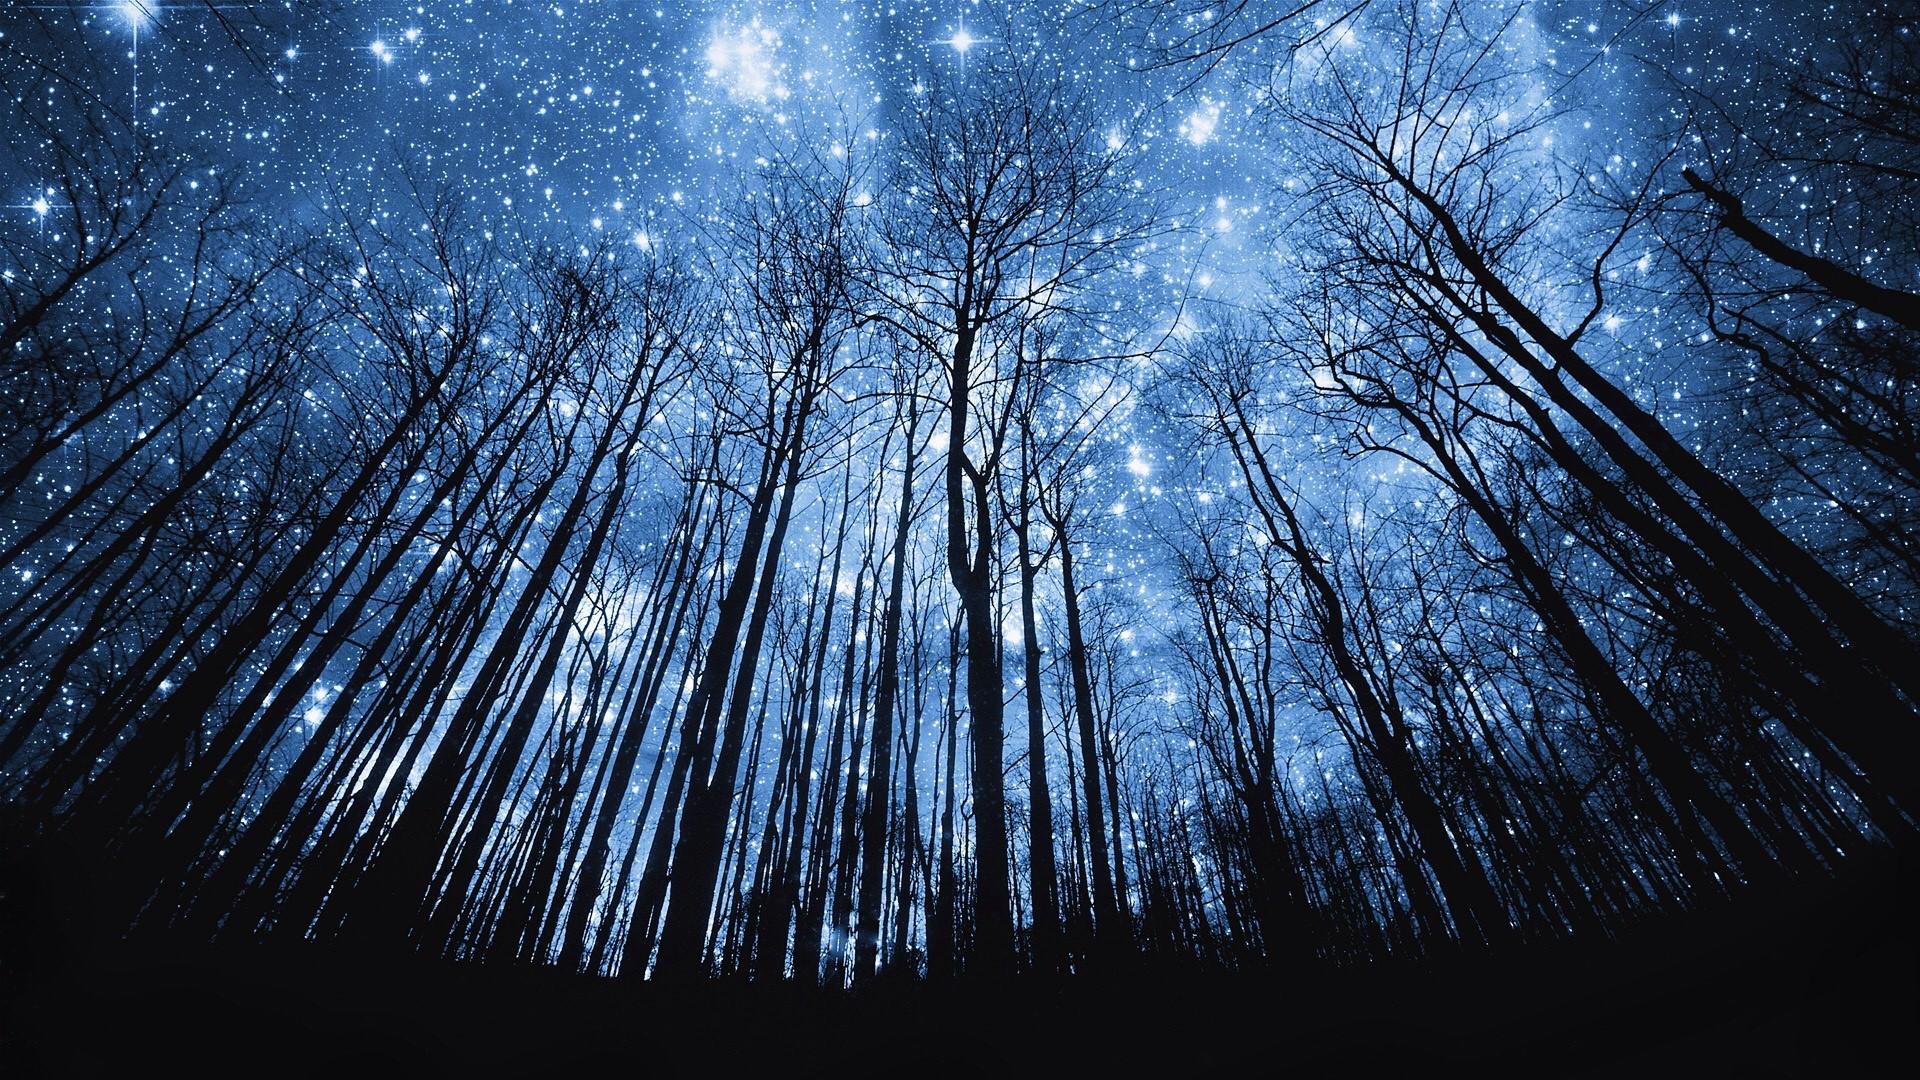 Starry Sky Over Trees Wallpaper